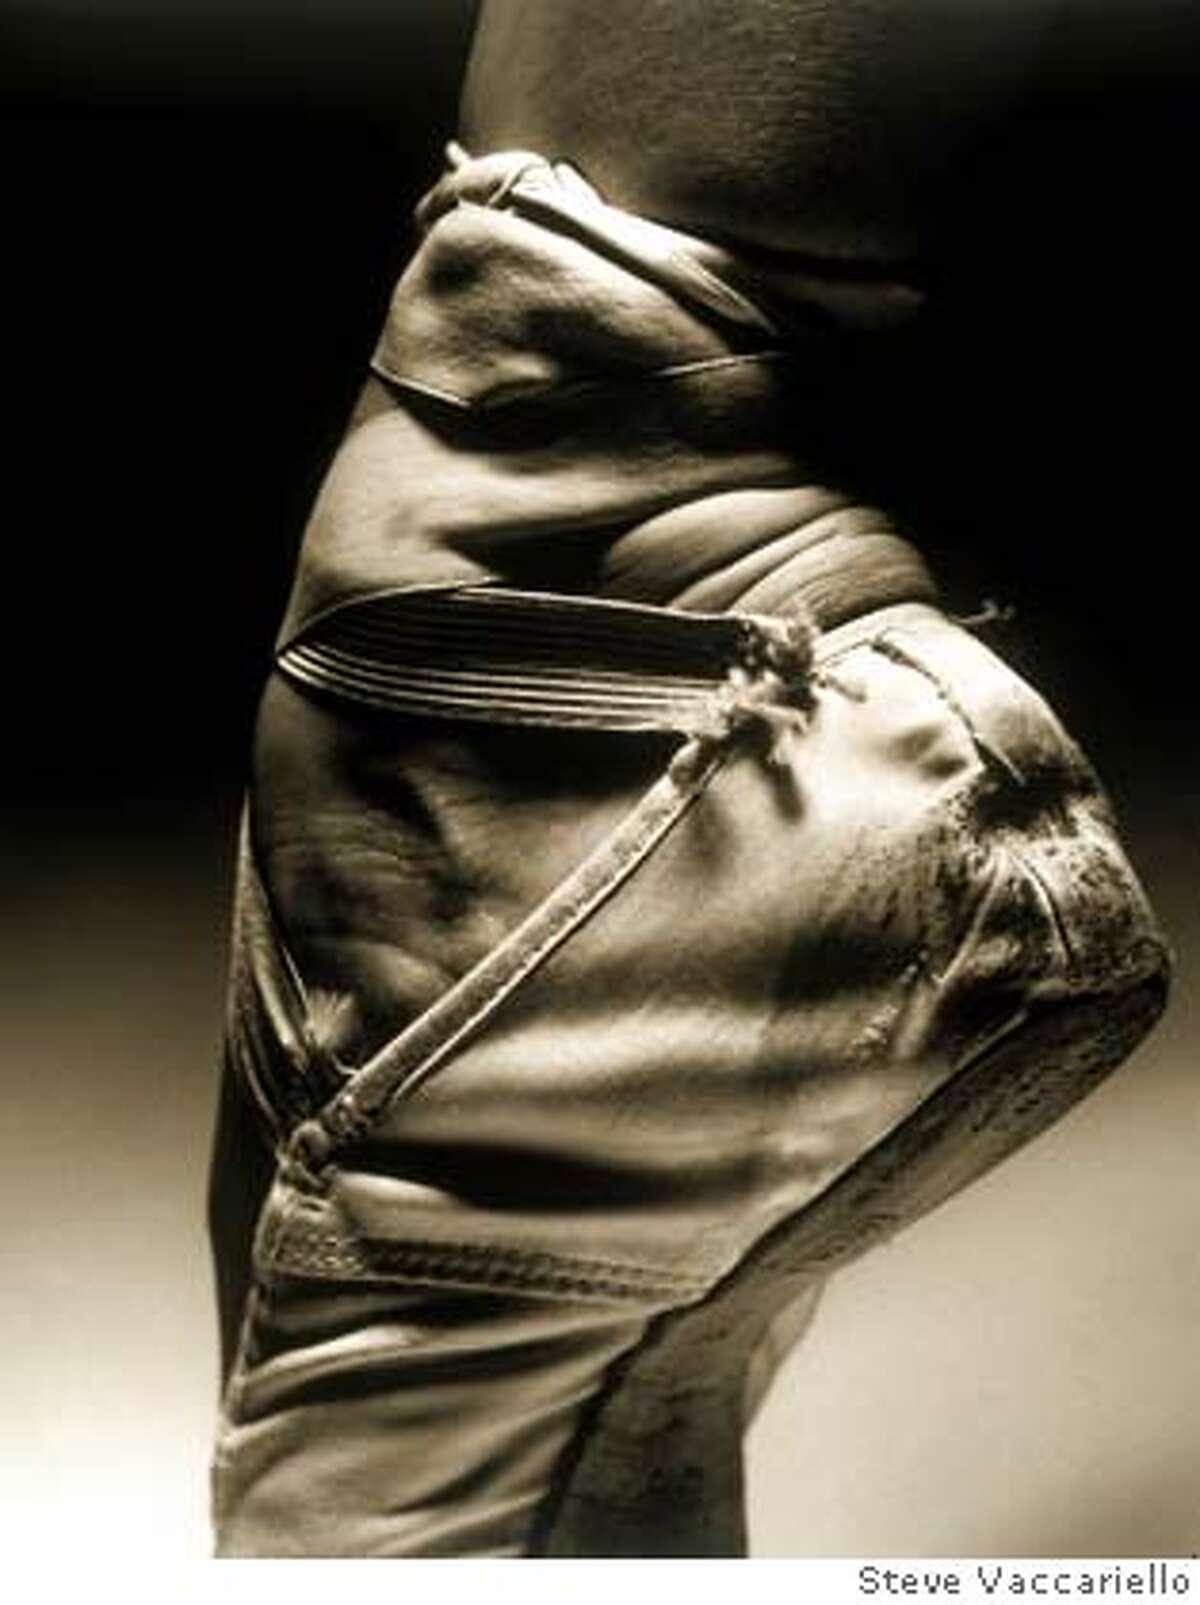 "Caption: Steve Vaccariello / ReleaseCode: ""b5143,�Vaccariello Creative Services, Inc.,talent,slippers,slipper,foot,performer,Pointe,position,practice,routine,shoe,silk,feet,entertainment,discipline,dedication,dancer,culture,ballerina,ballet,arts,people,person,b/w"" / Color: vertical"